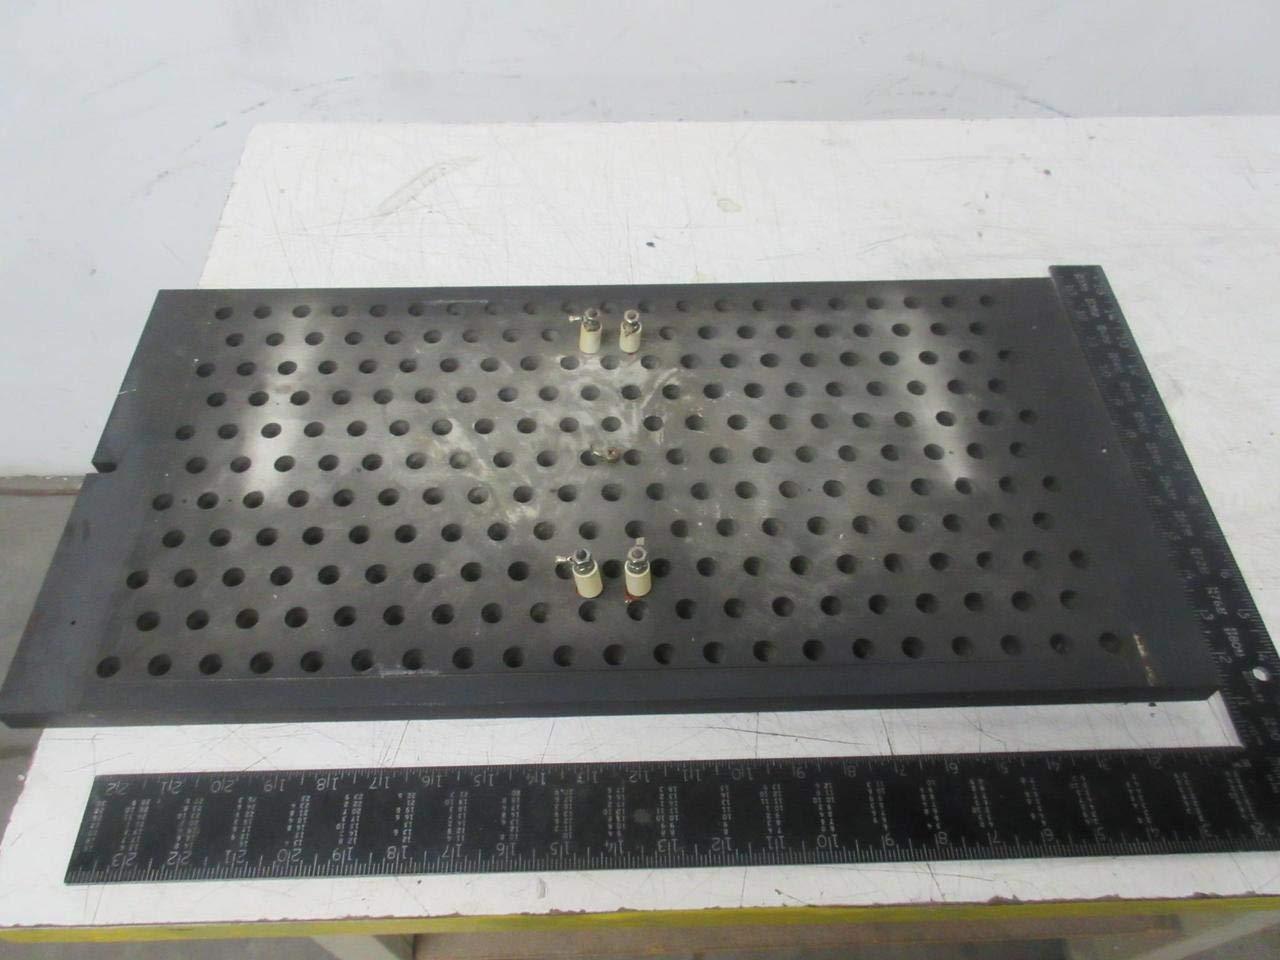 Heatron KP11R23R1A Reflow Oven Heating Element 4300 Watt T110841